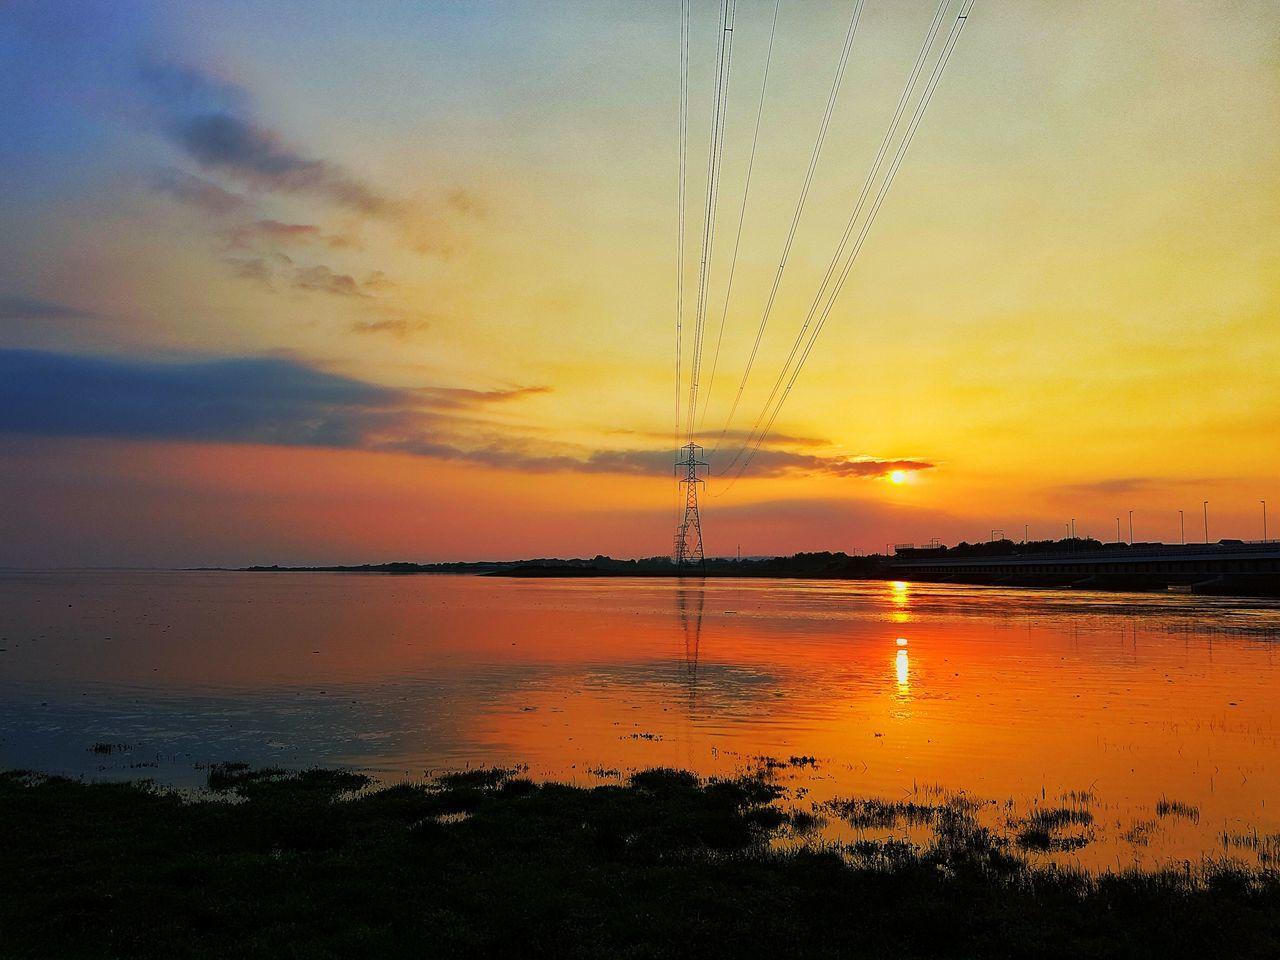 Sunset Water Scenics Tranquil Scene Reflection Orange Color Tranquility Idyllic Sky Beauty In Nature Nature Majestic Calm Cloud Cloud - Sky Sun Non-urban Scene Power Line  Coastline Sea